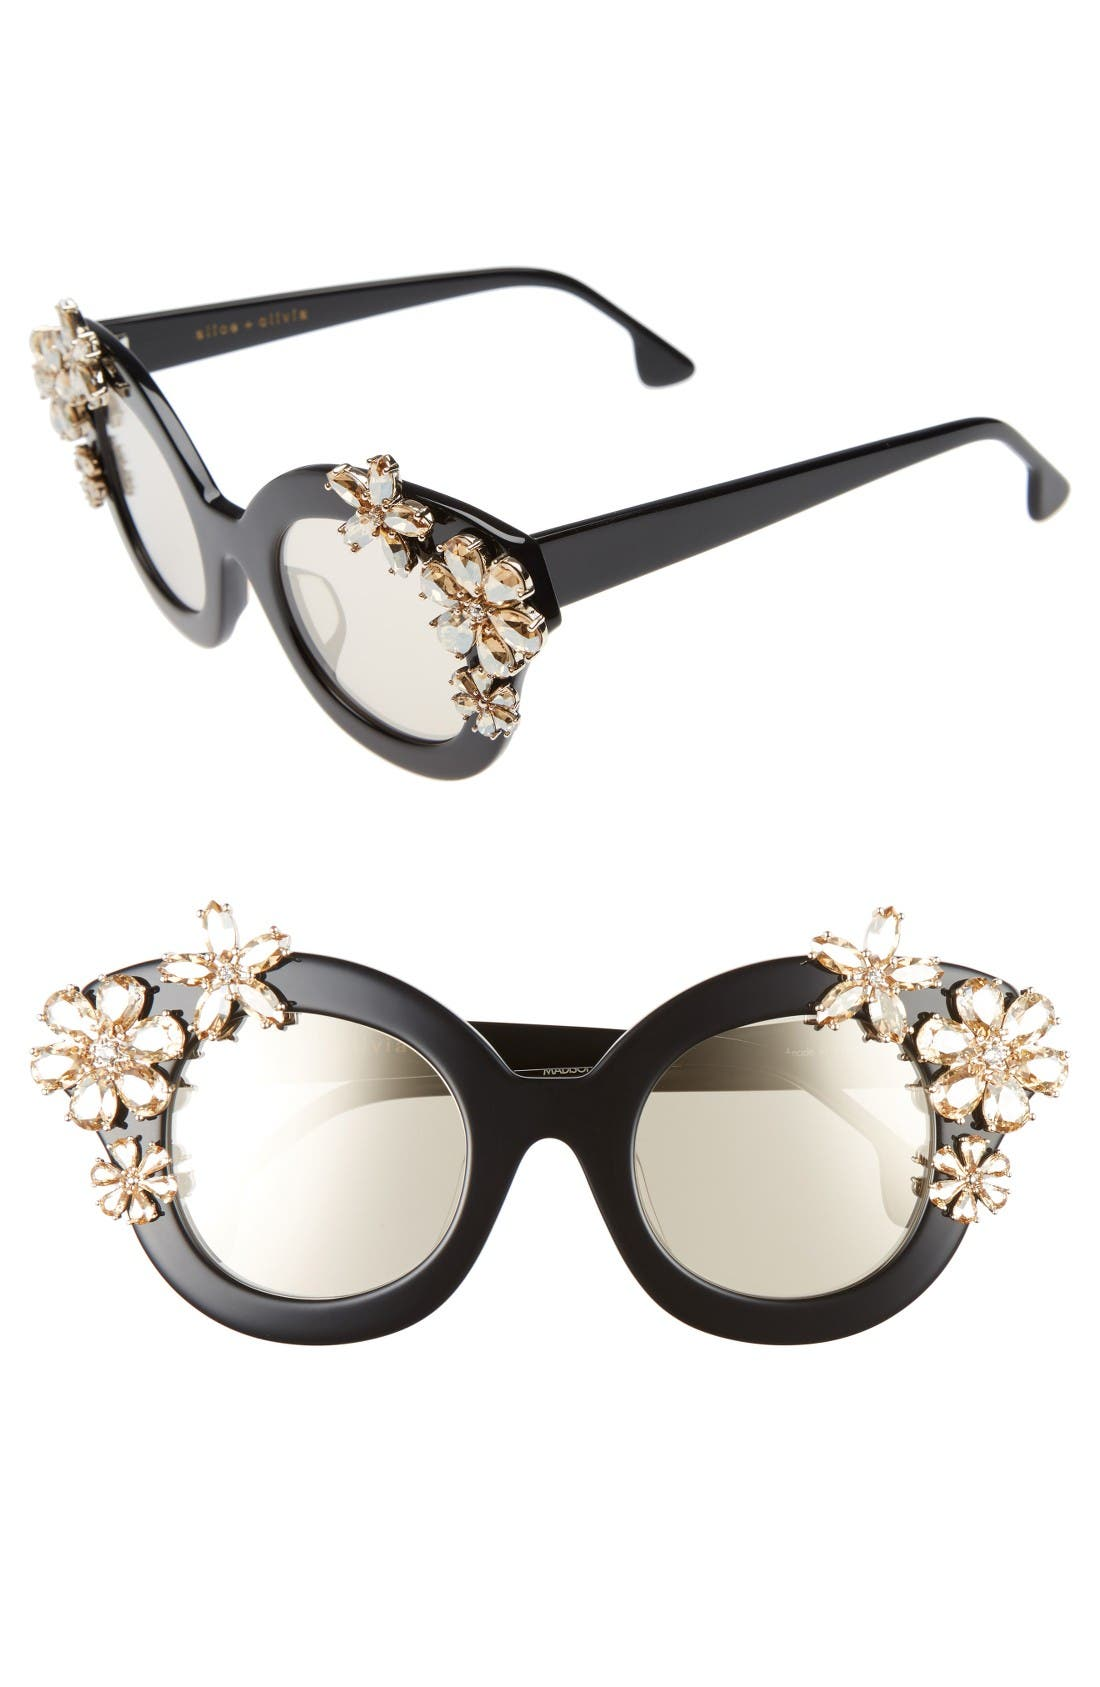 Main Image - Alice + Olivia Madison Floral 46mm Gradient Lens Embellished Sunglasses